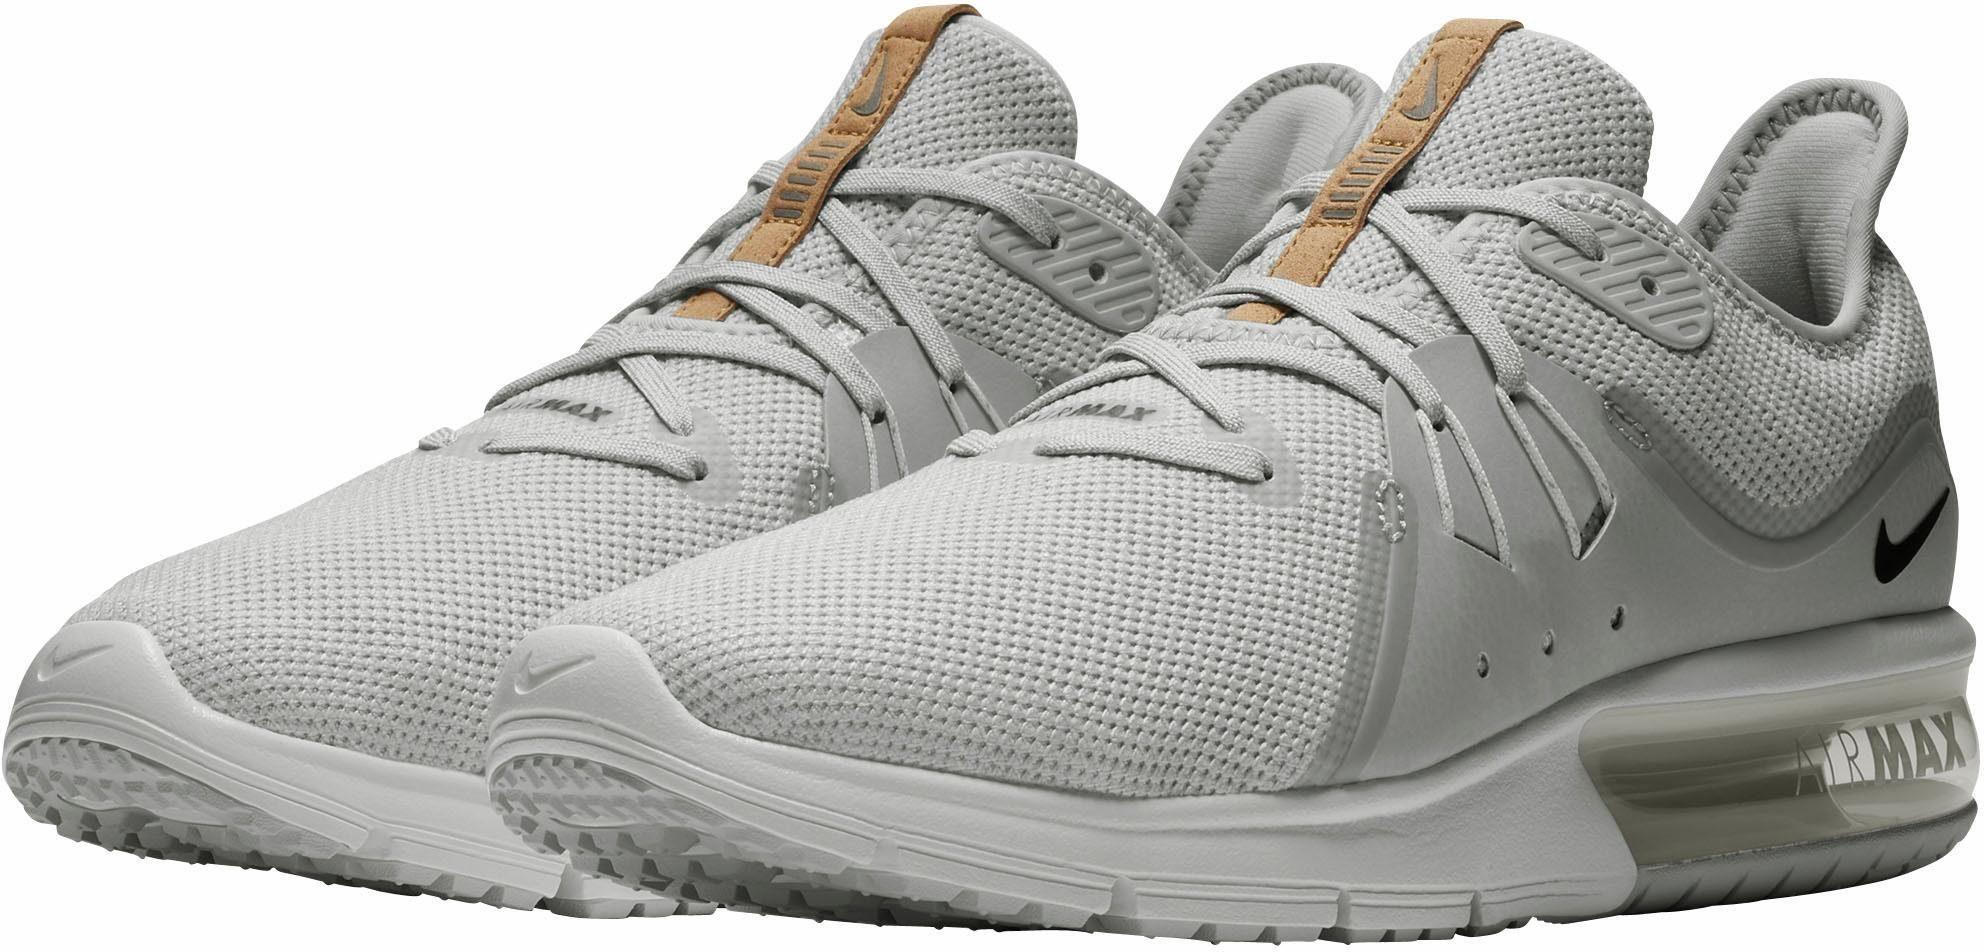 Nike Sportswear »Air Max Sequent 3« Sneaker kaufen | OTTO